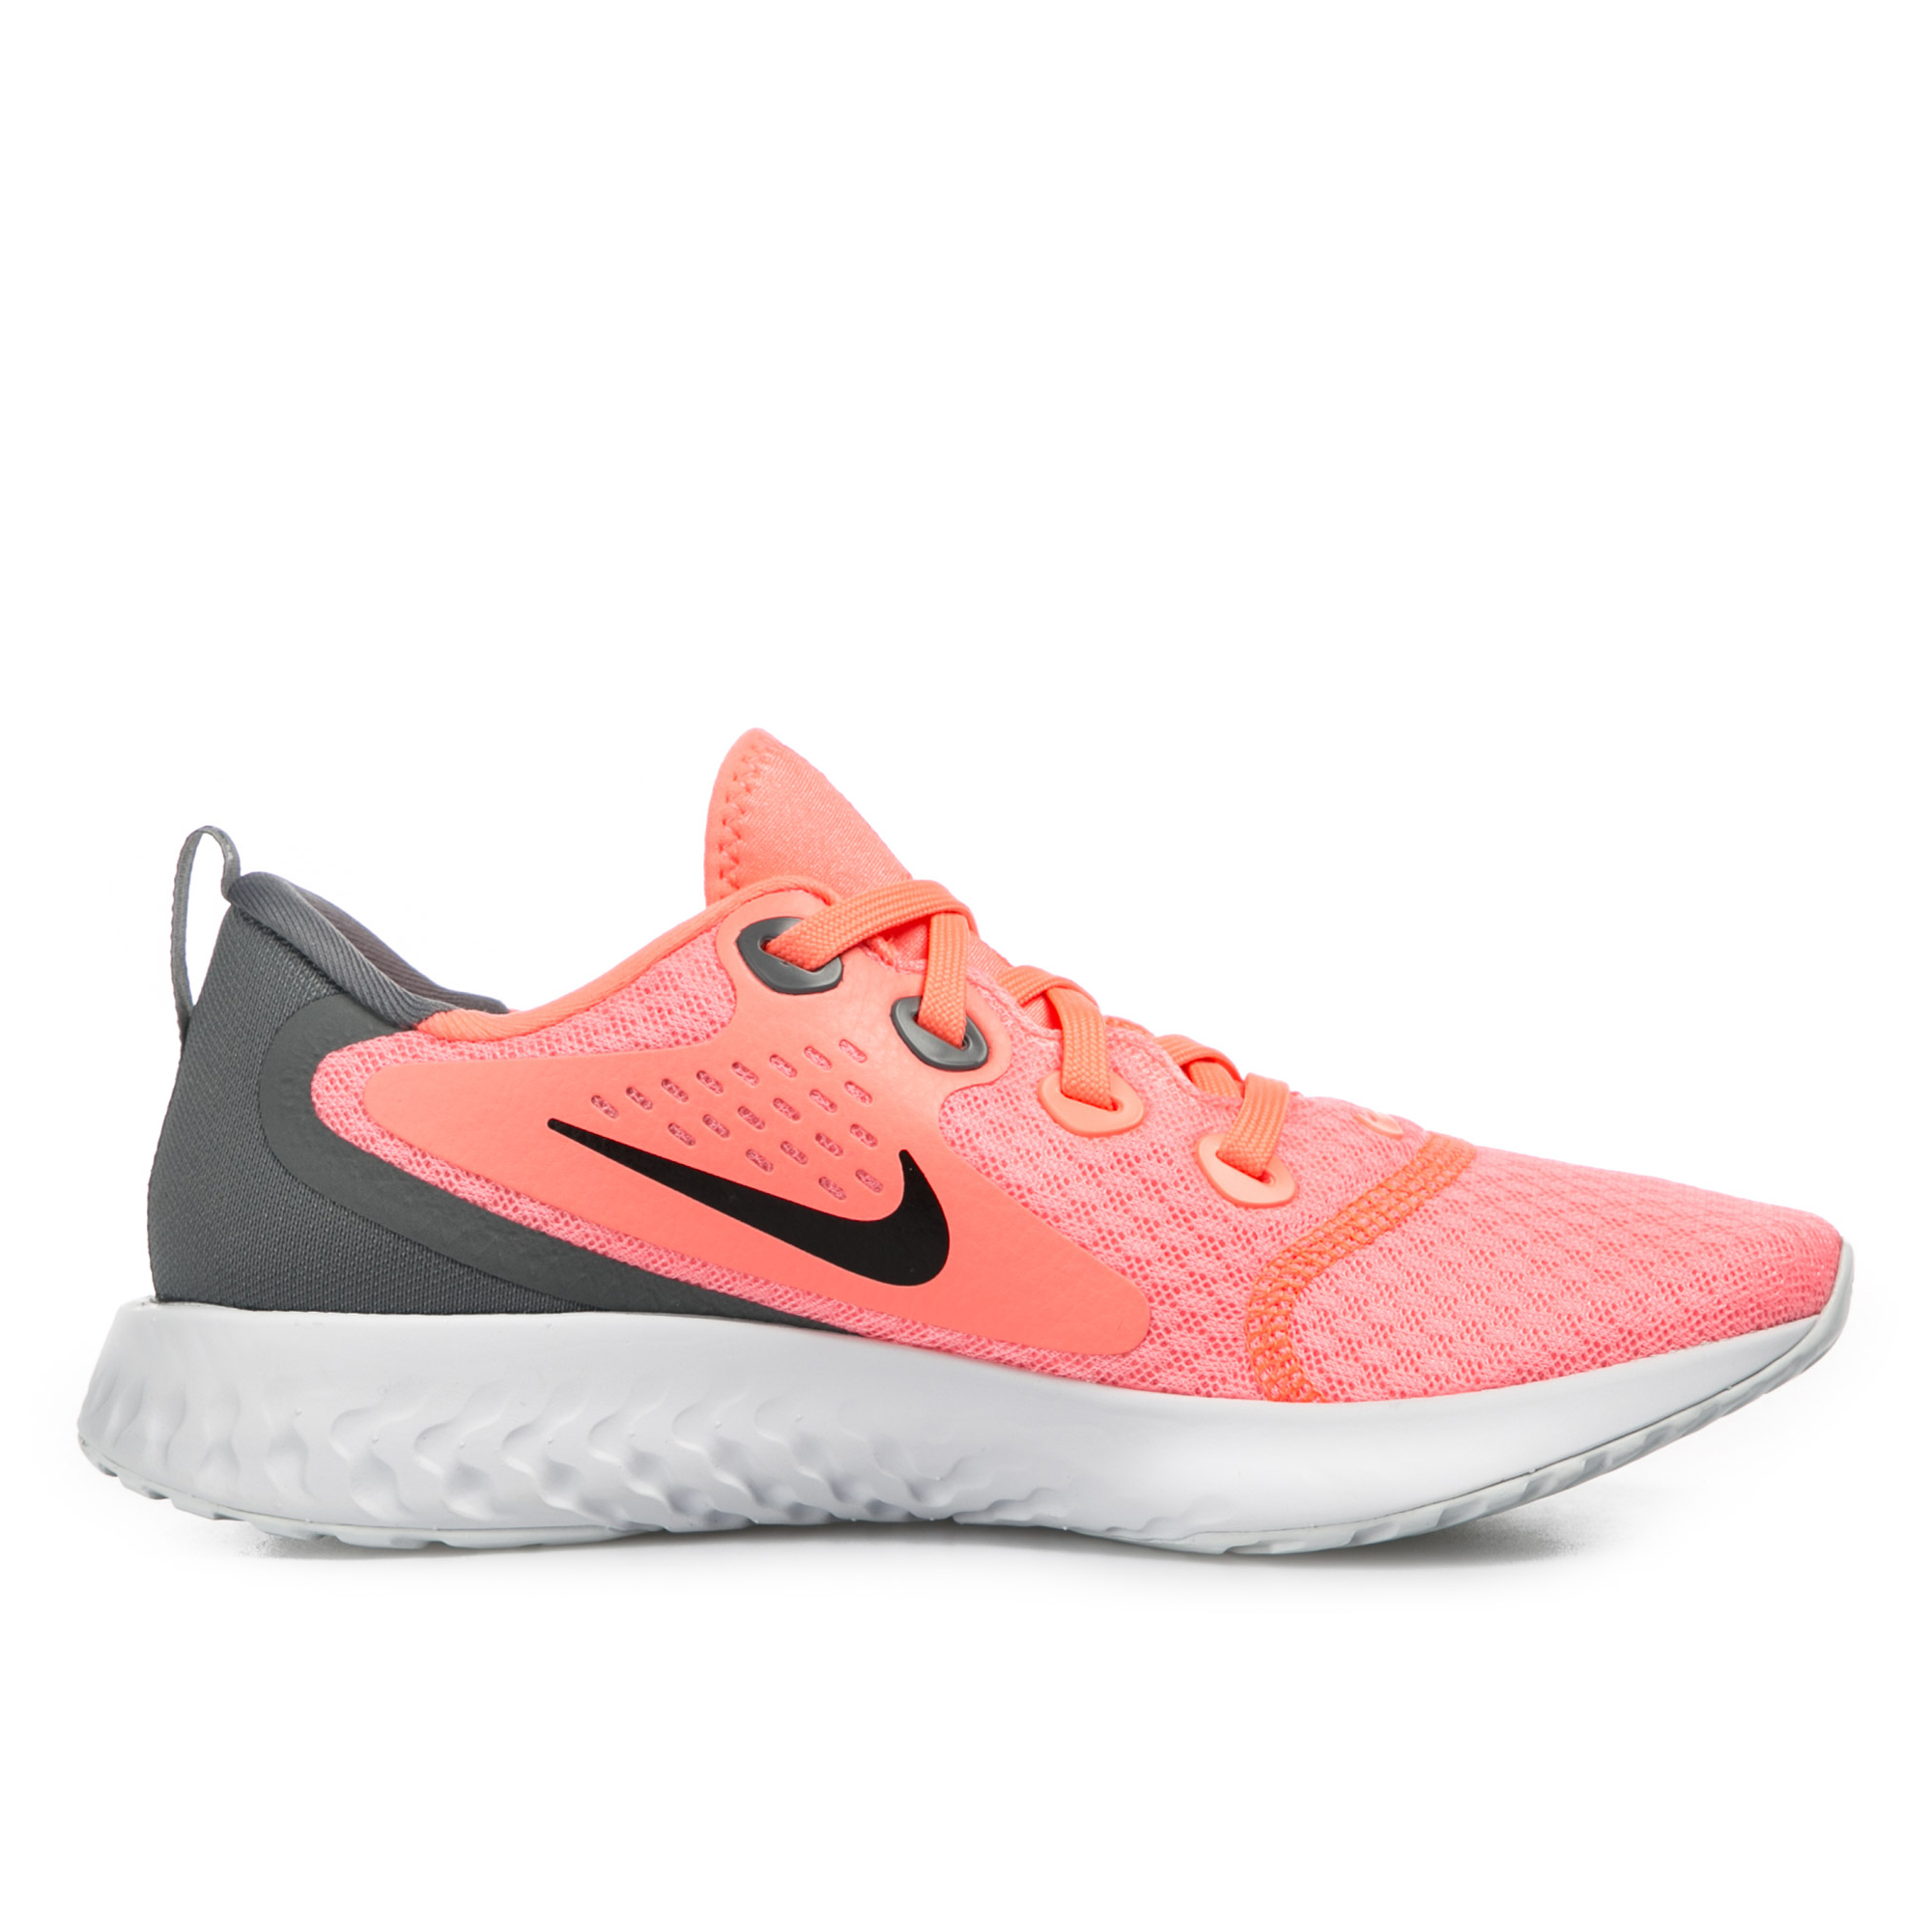 Nike Wmns Legend React - SPORT SHOES RUNNING SHOES - Superfanas lt